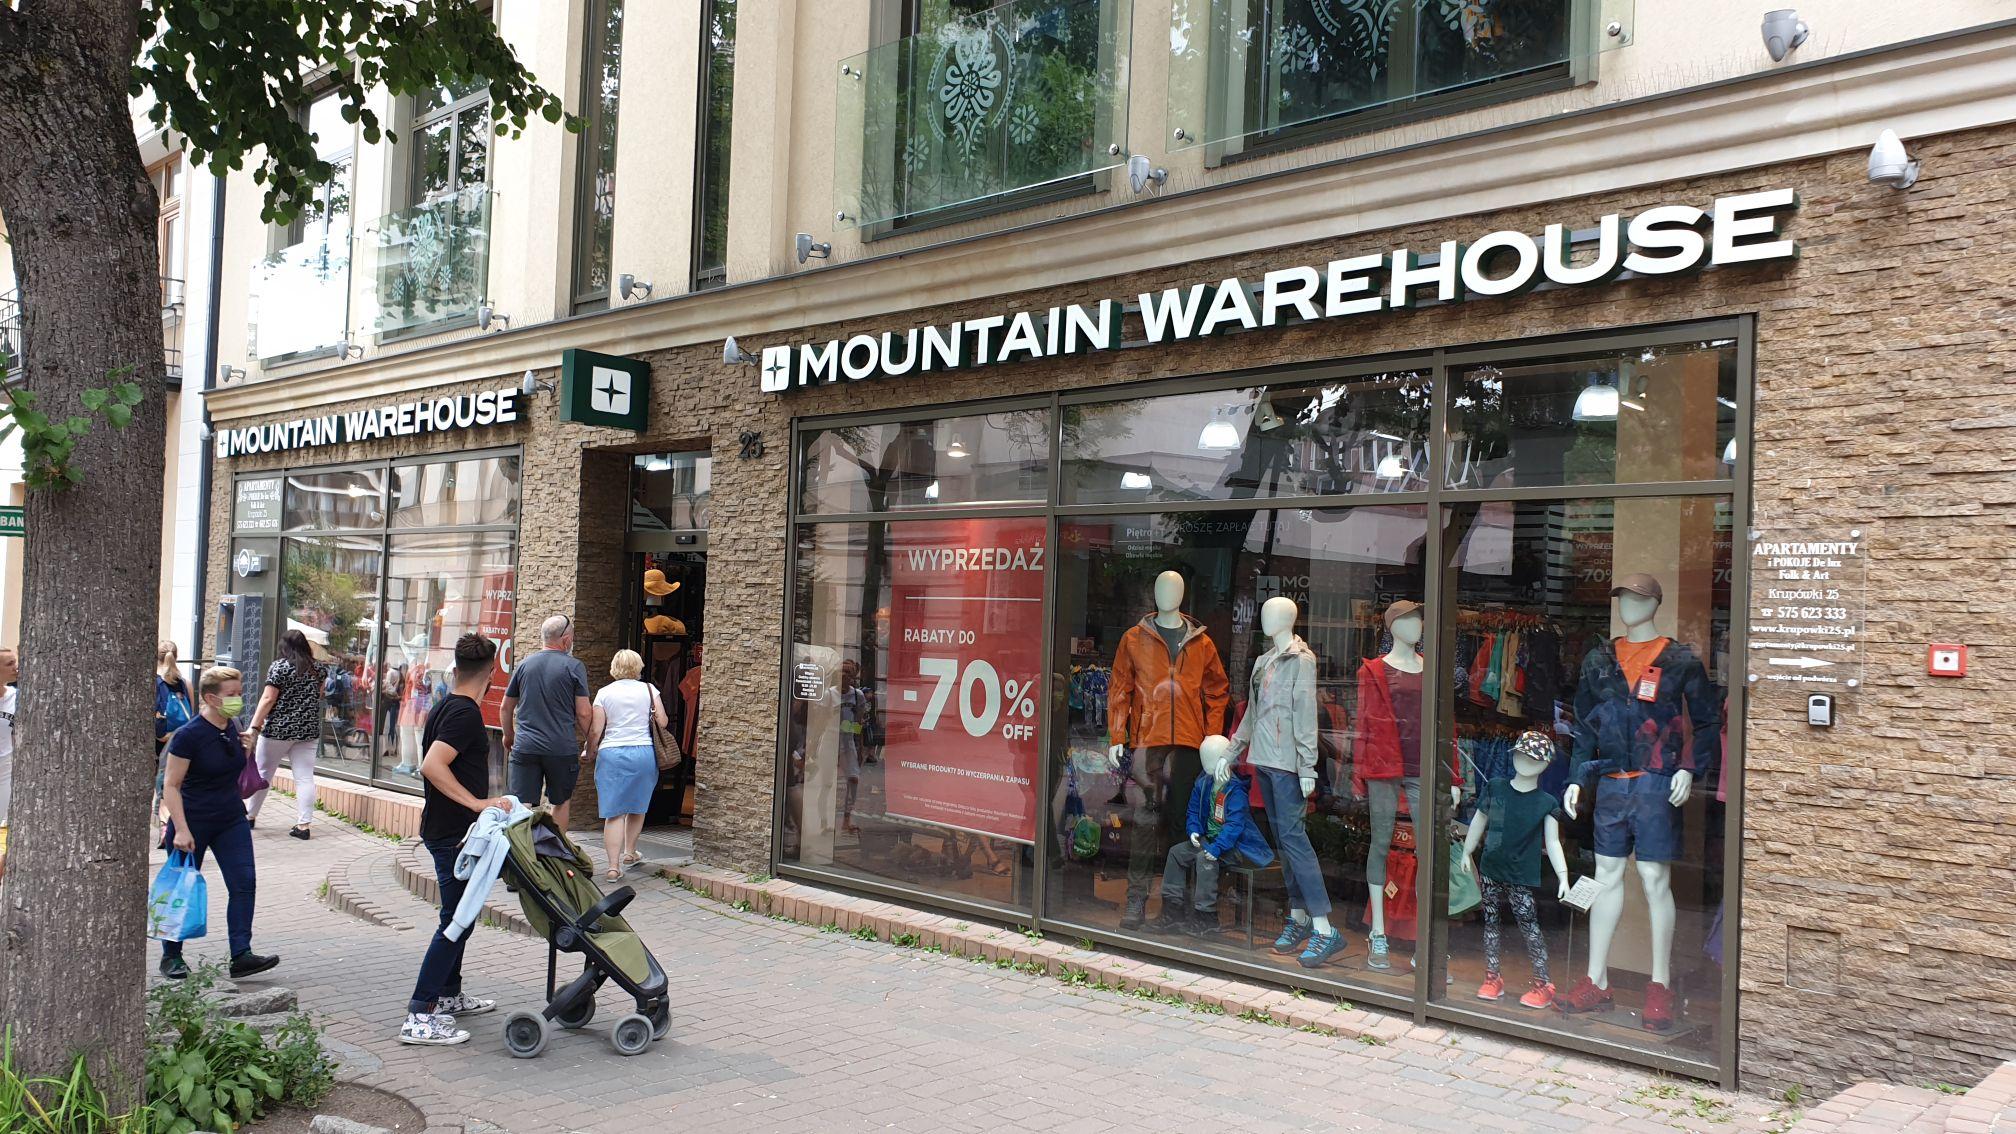 Wodoodporne buty męskie Adventurer - Mountain Warehouse, Krupówki 25, Zakopane